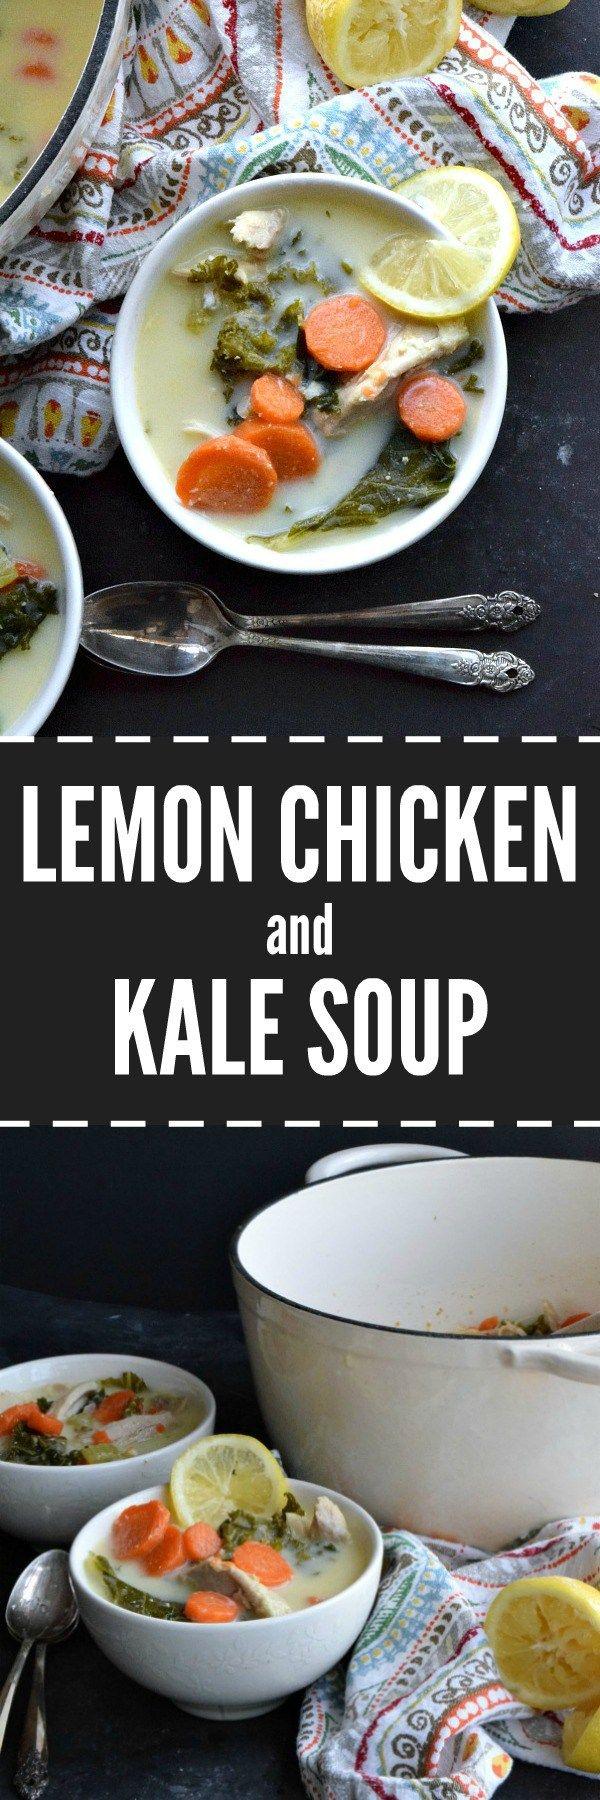 Lemon Chicken and Kale Soup